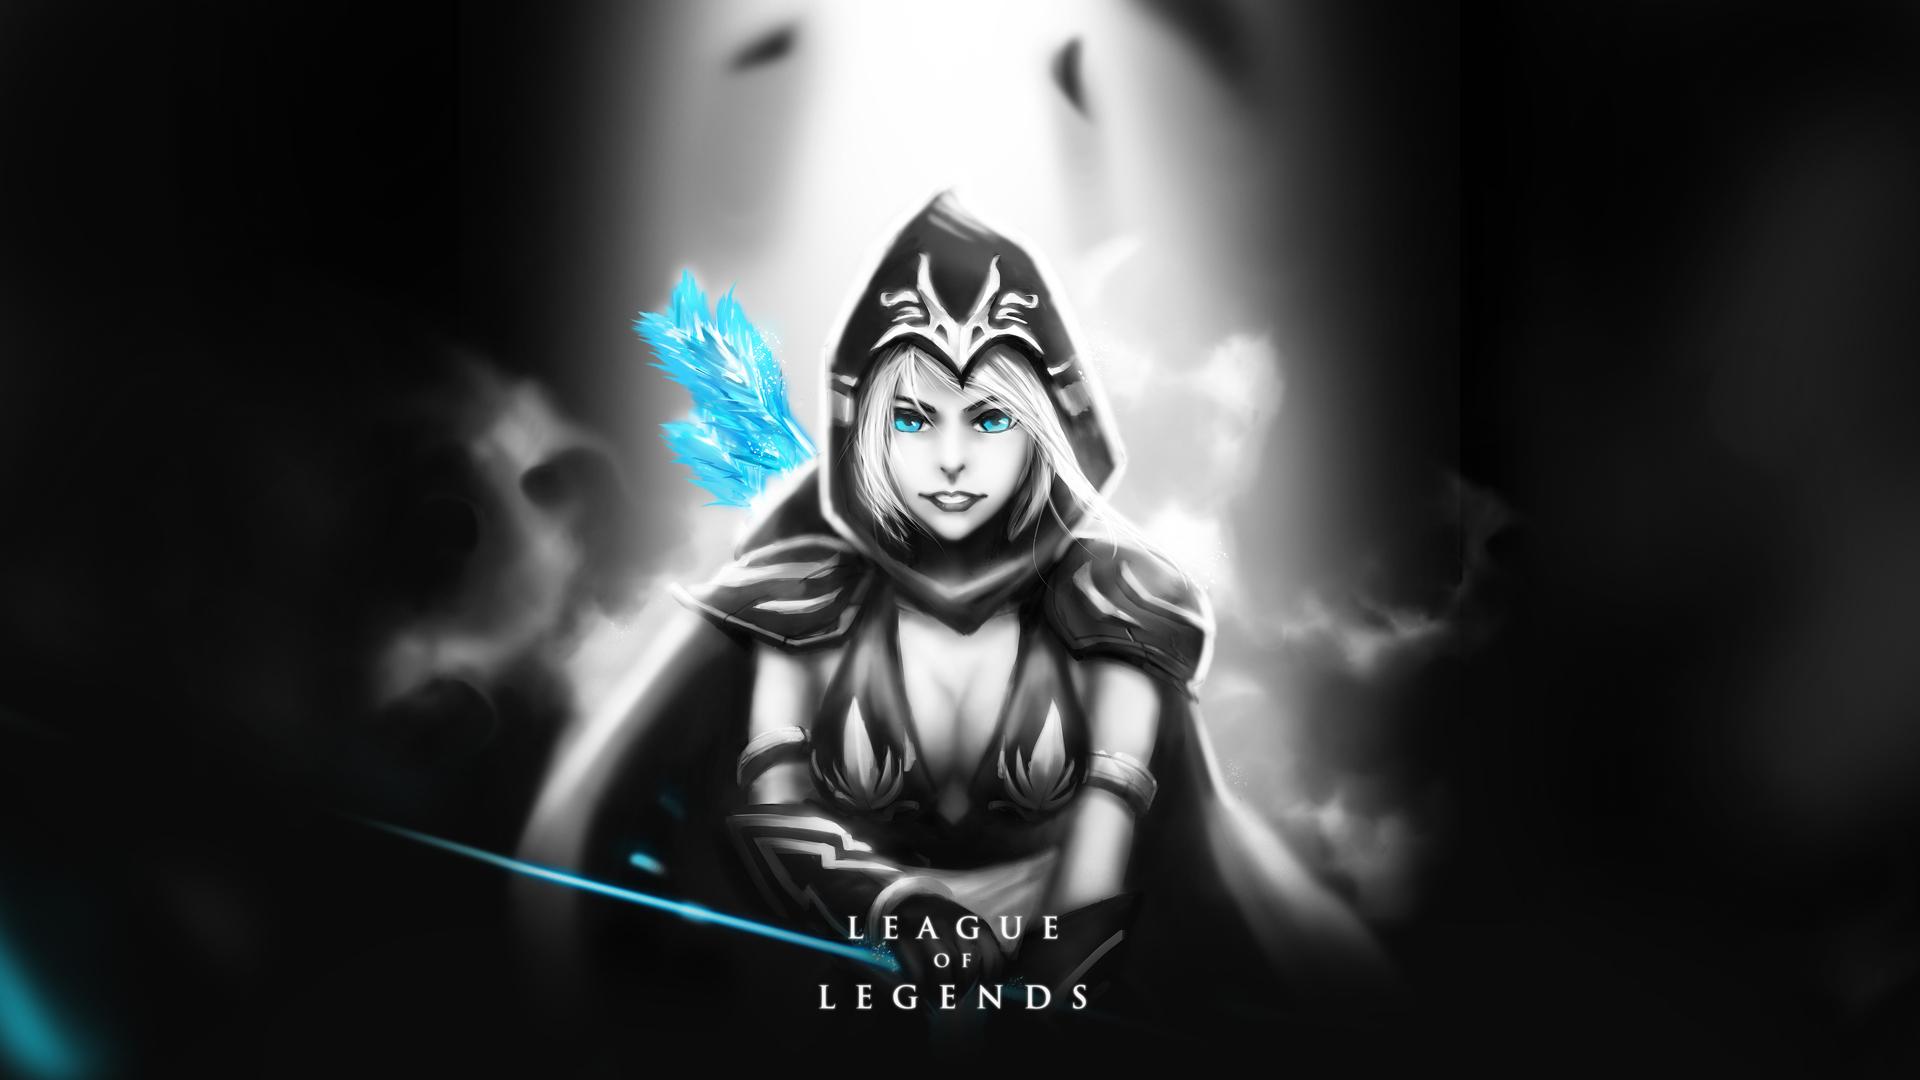 League of Legends wallpaper 102